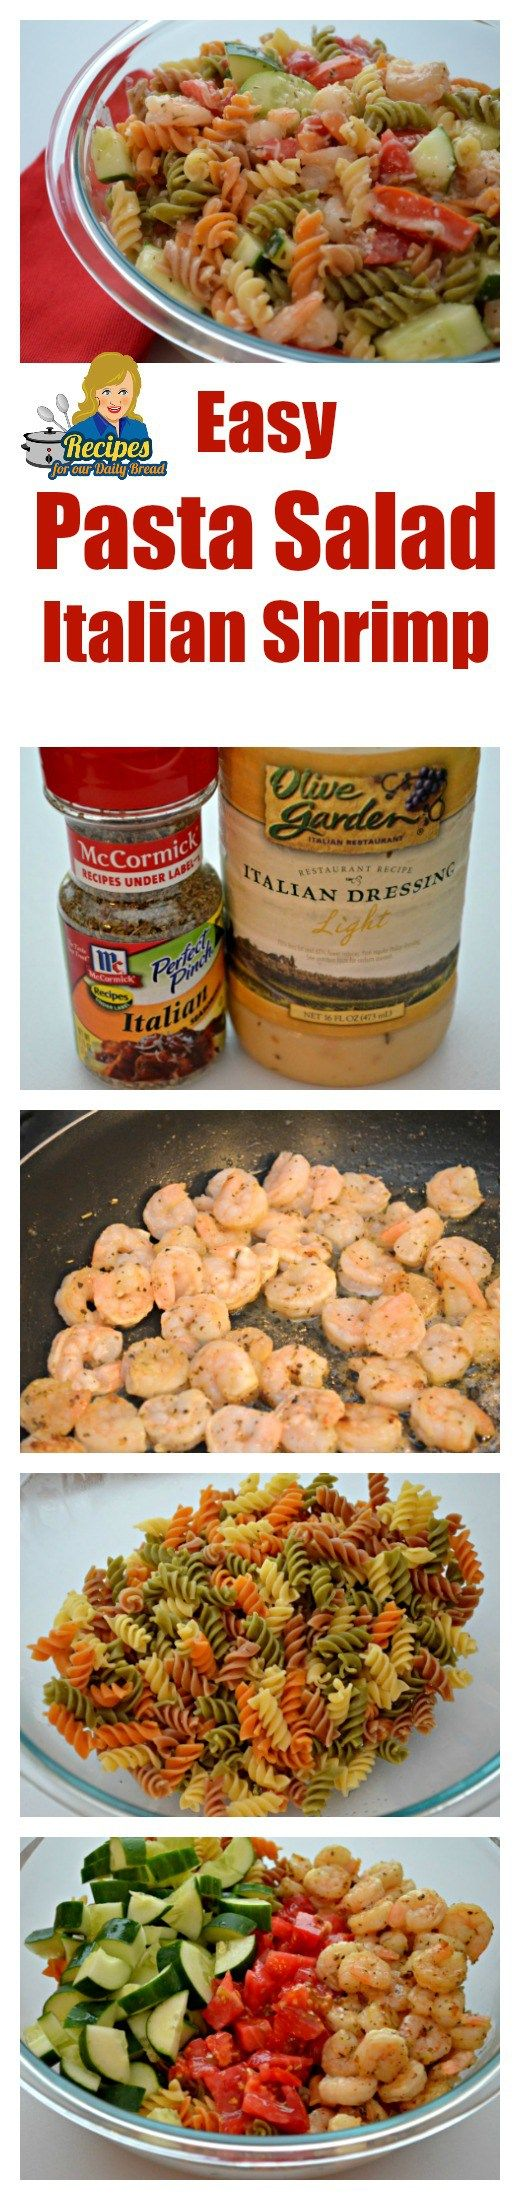 This Easy Pasta Salad Italian Shrimp is made with a bottle of Italian dressing, Italian seasoning, pasta, shrimp, cucumber, tomato and Italian Cheese.